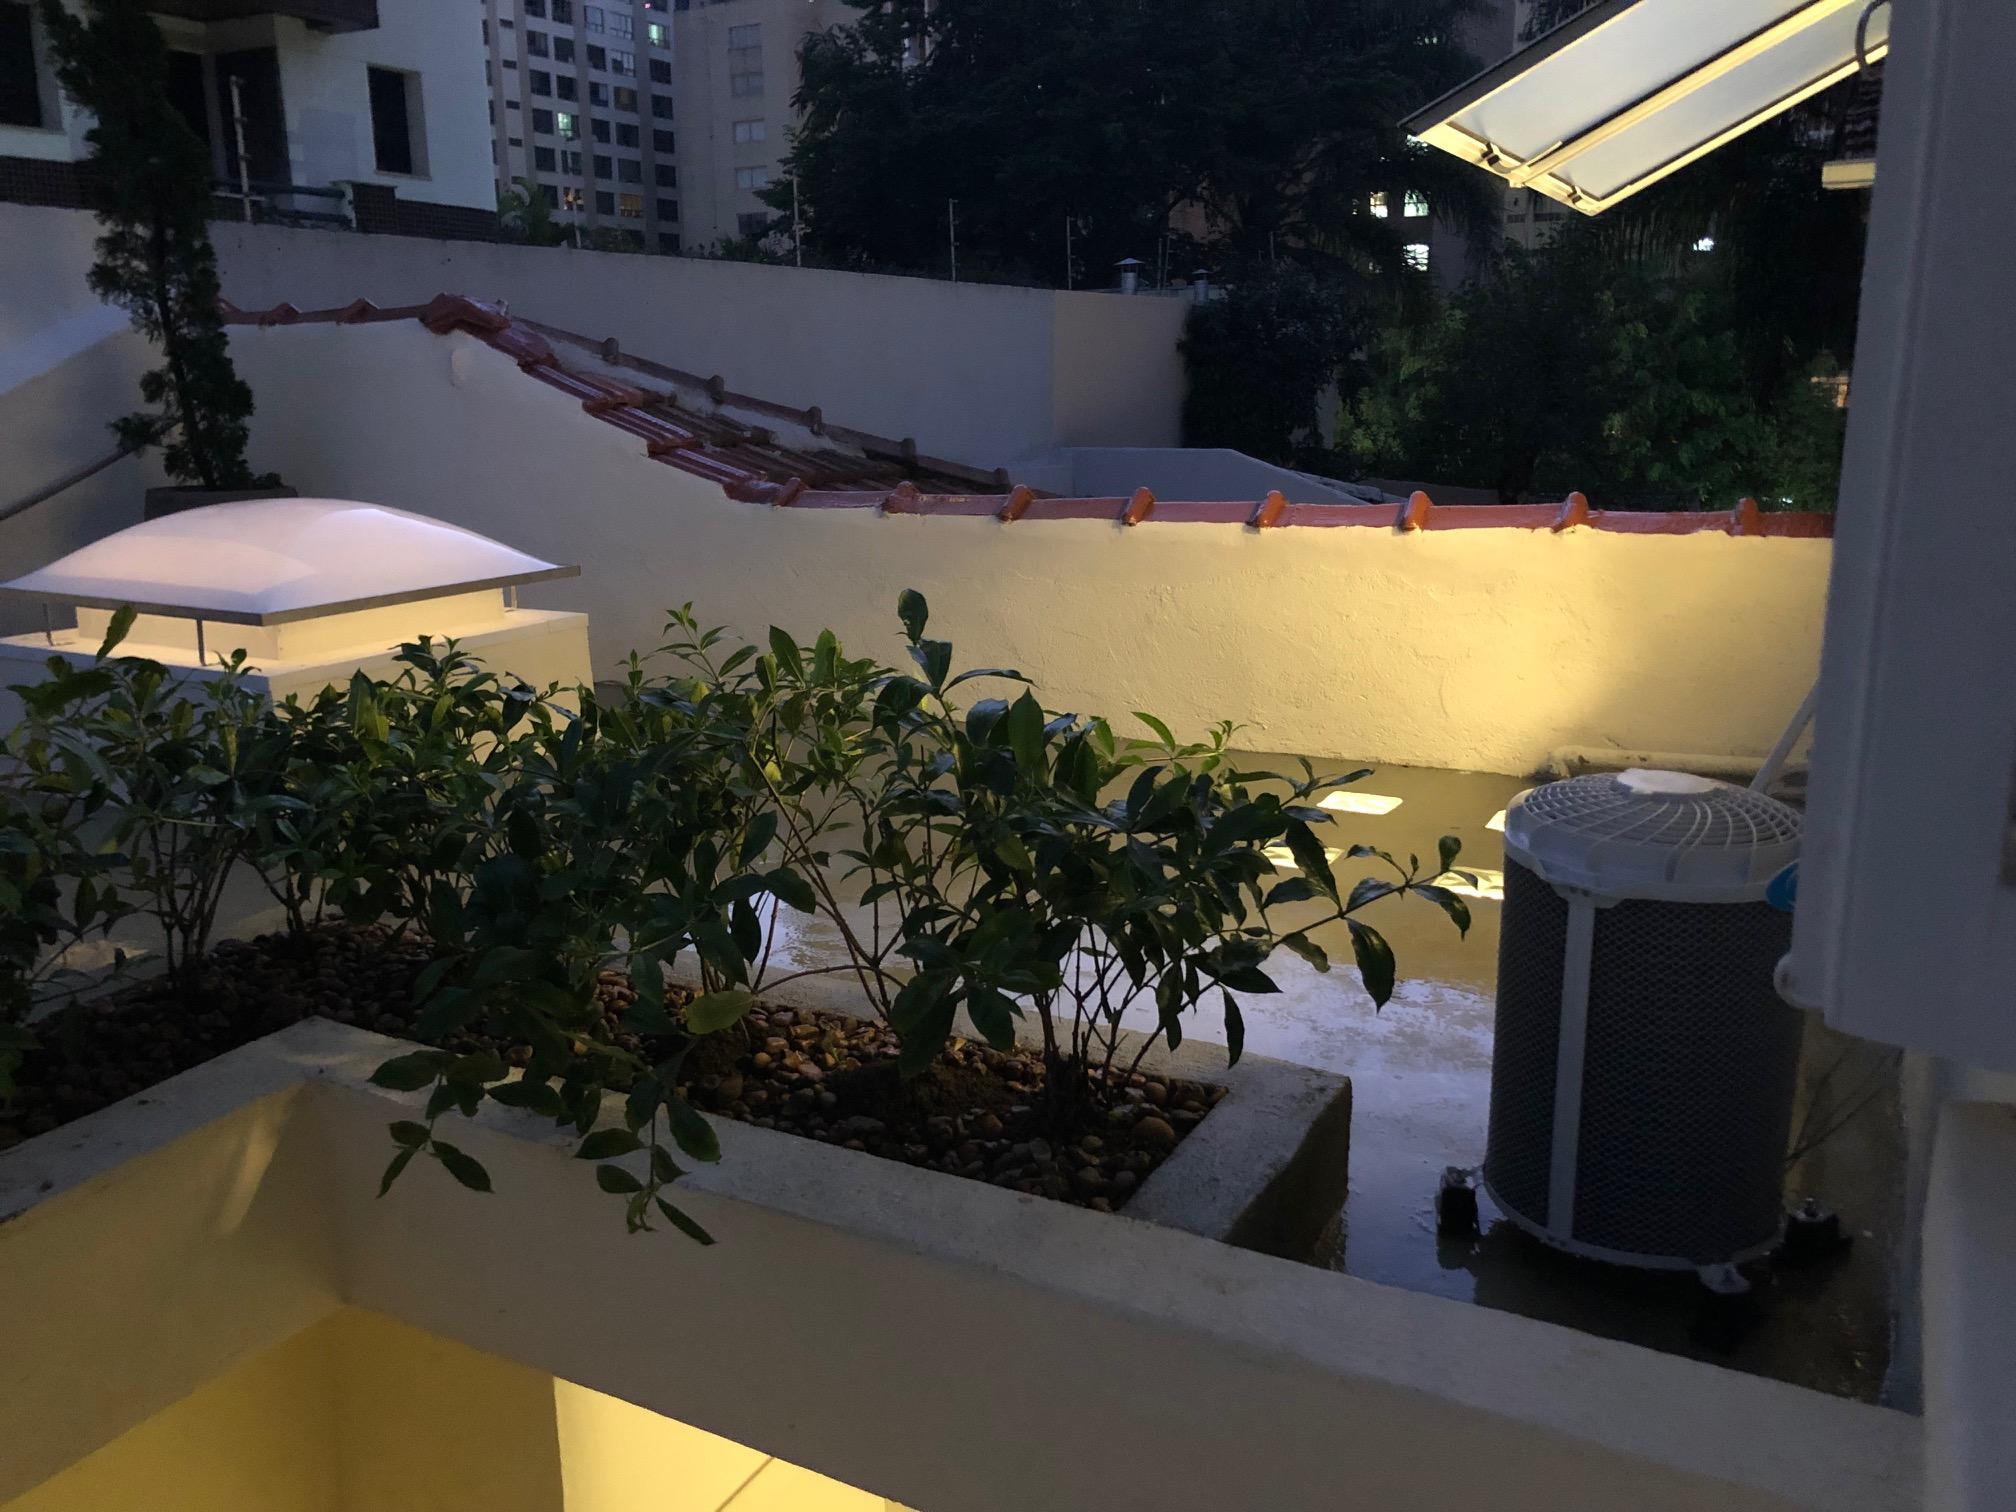 sala 5 - vista noturna.jpg